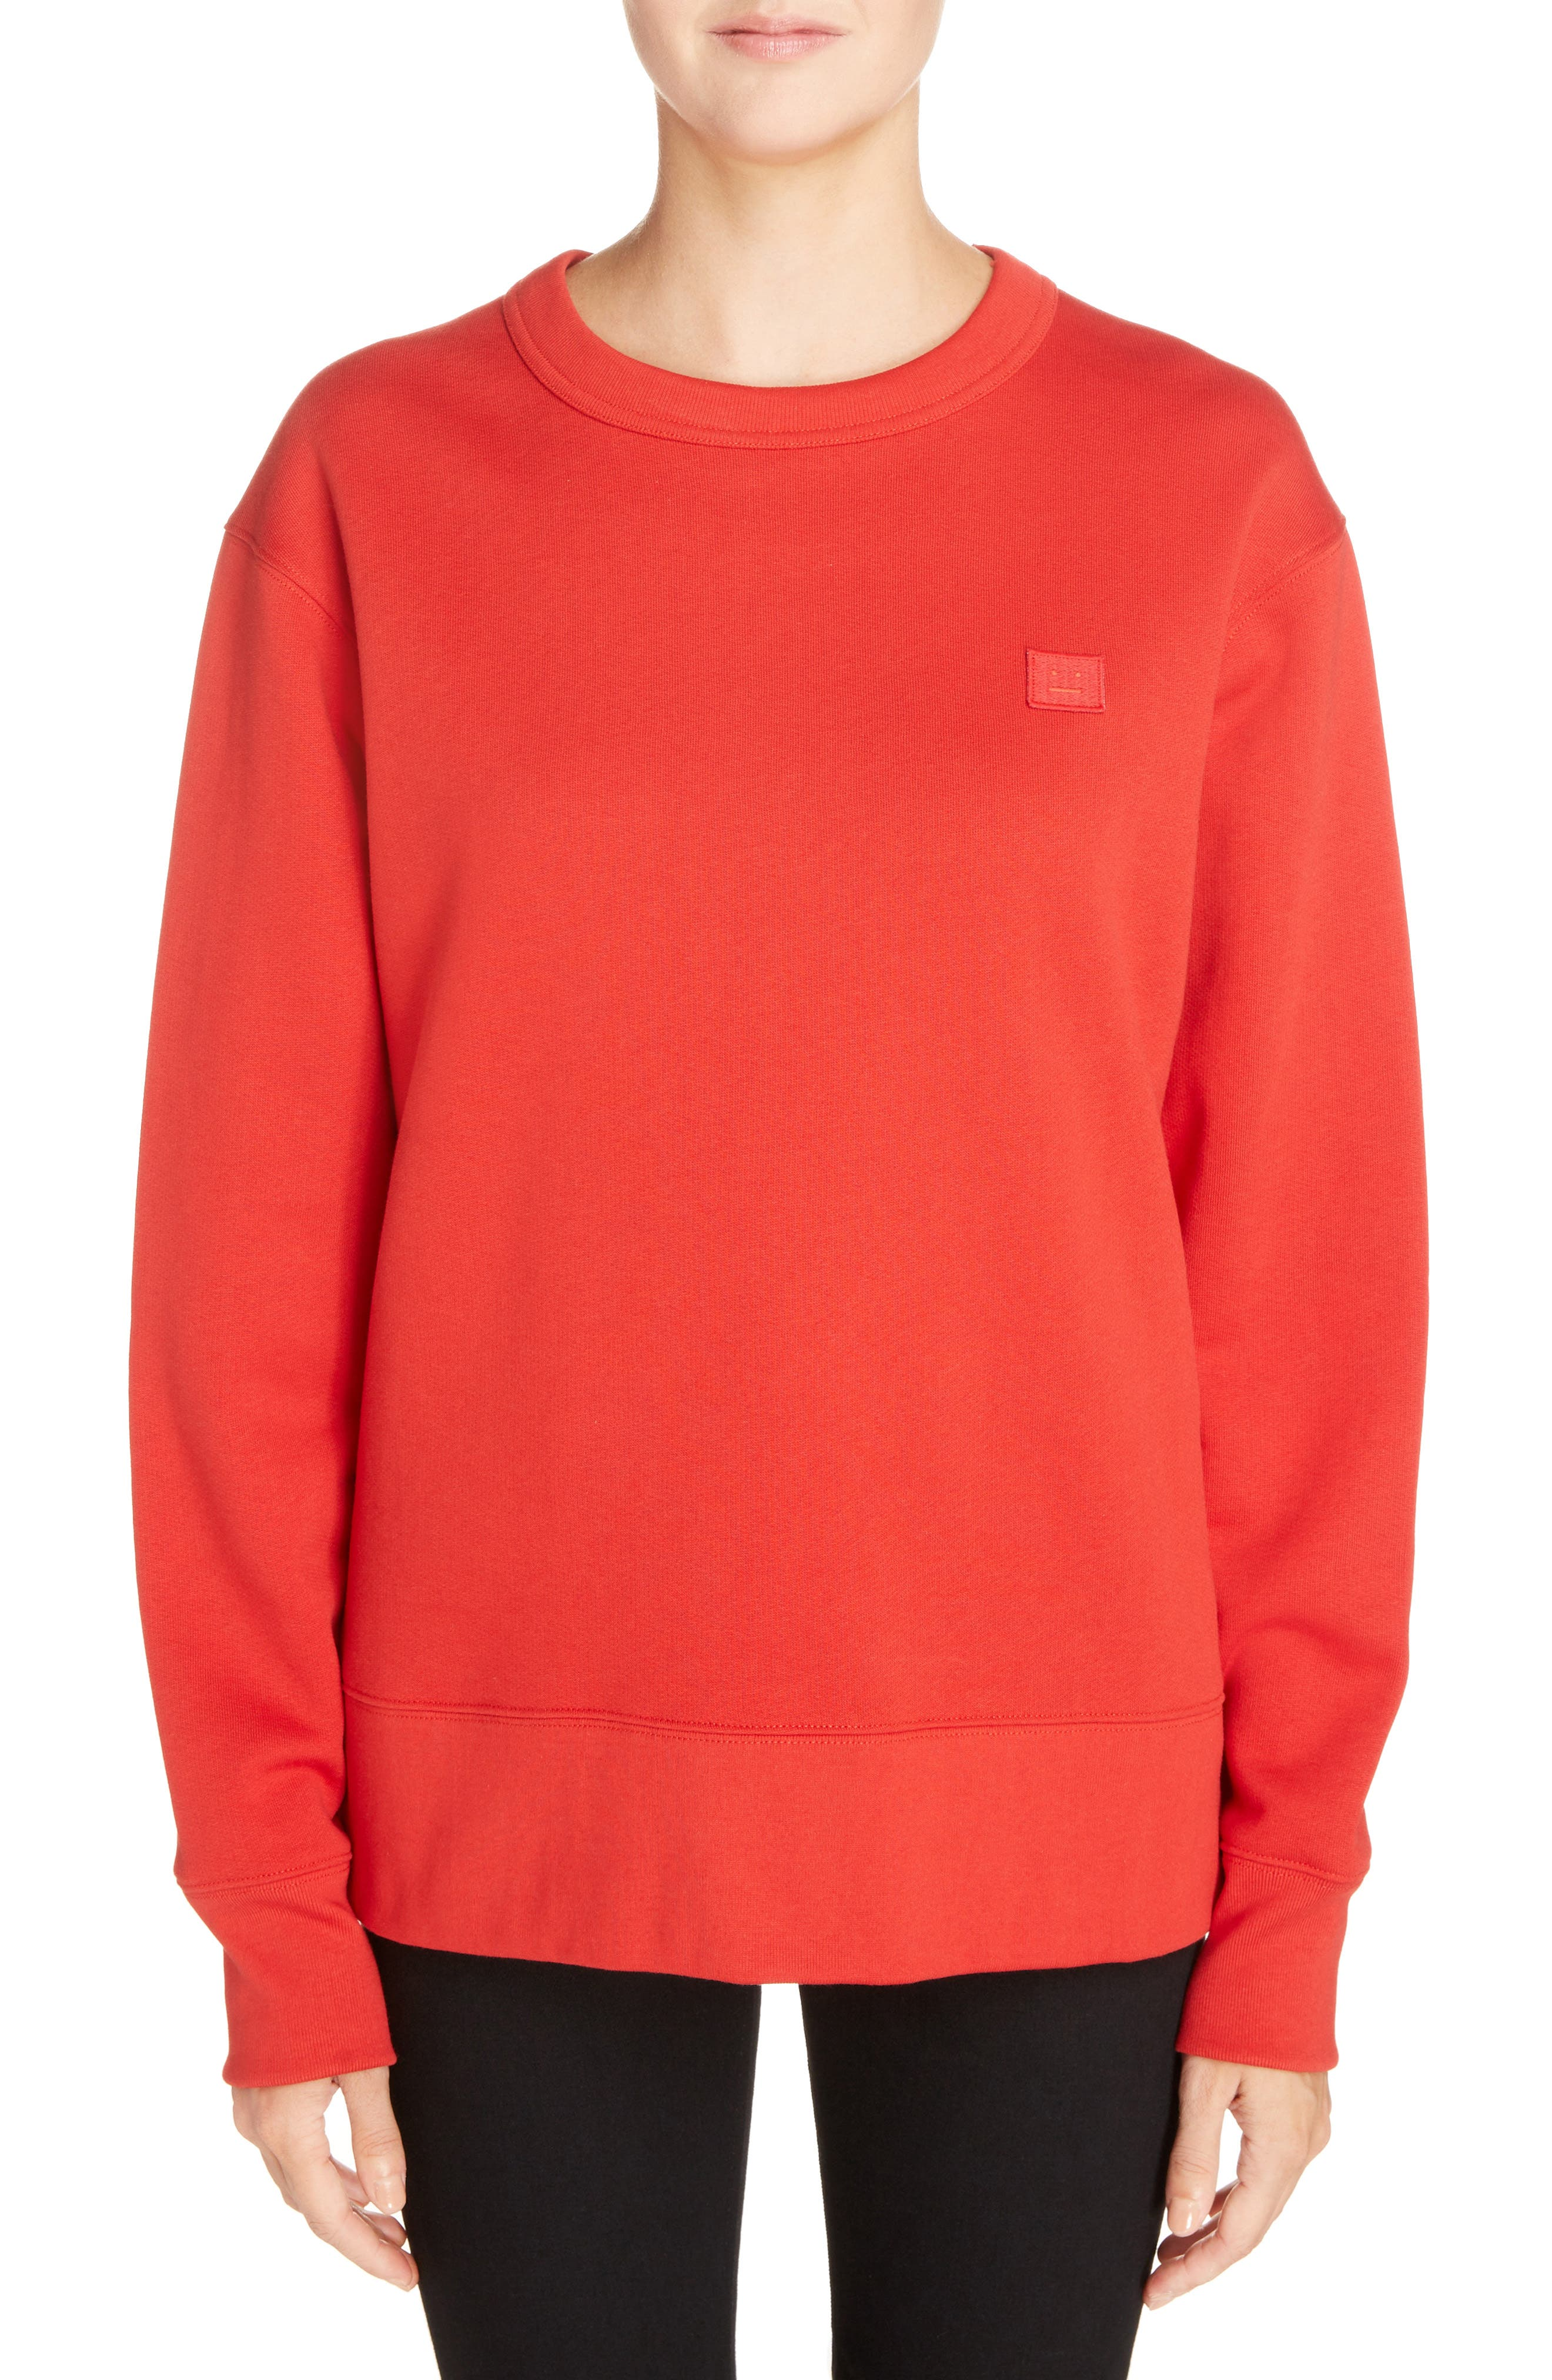 ACNE Studios Fairview Crewneck Sweatshirt